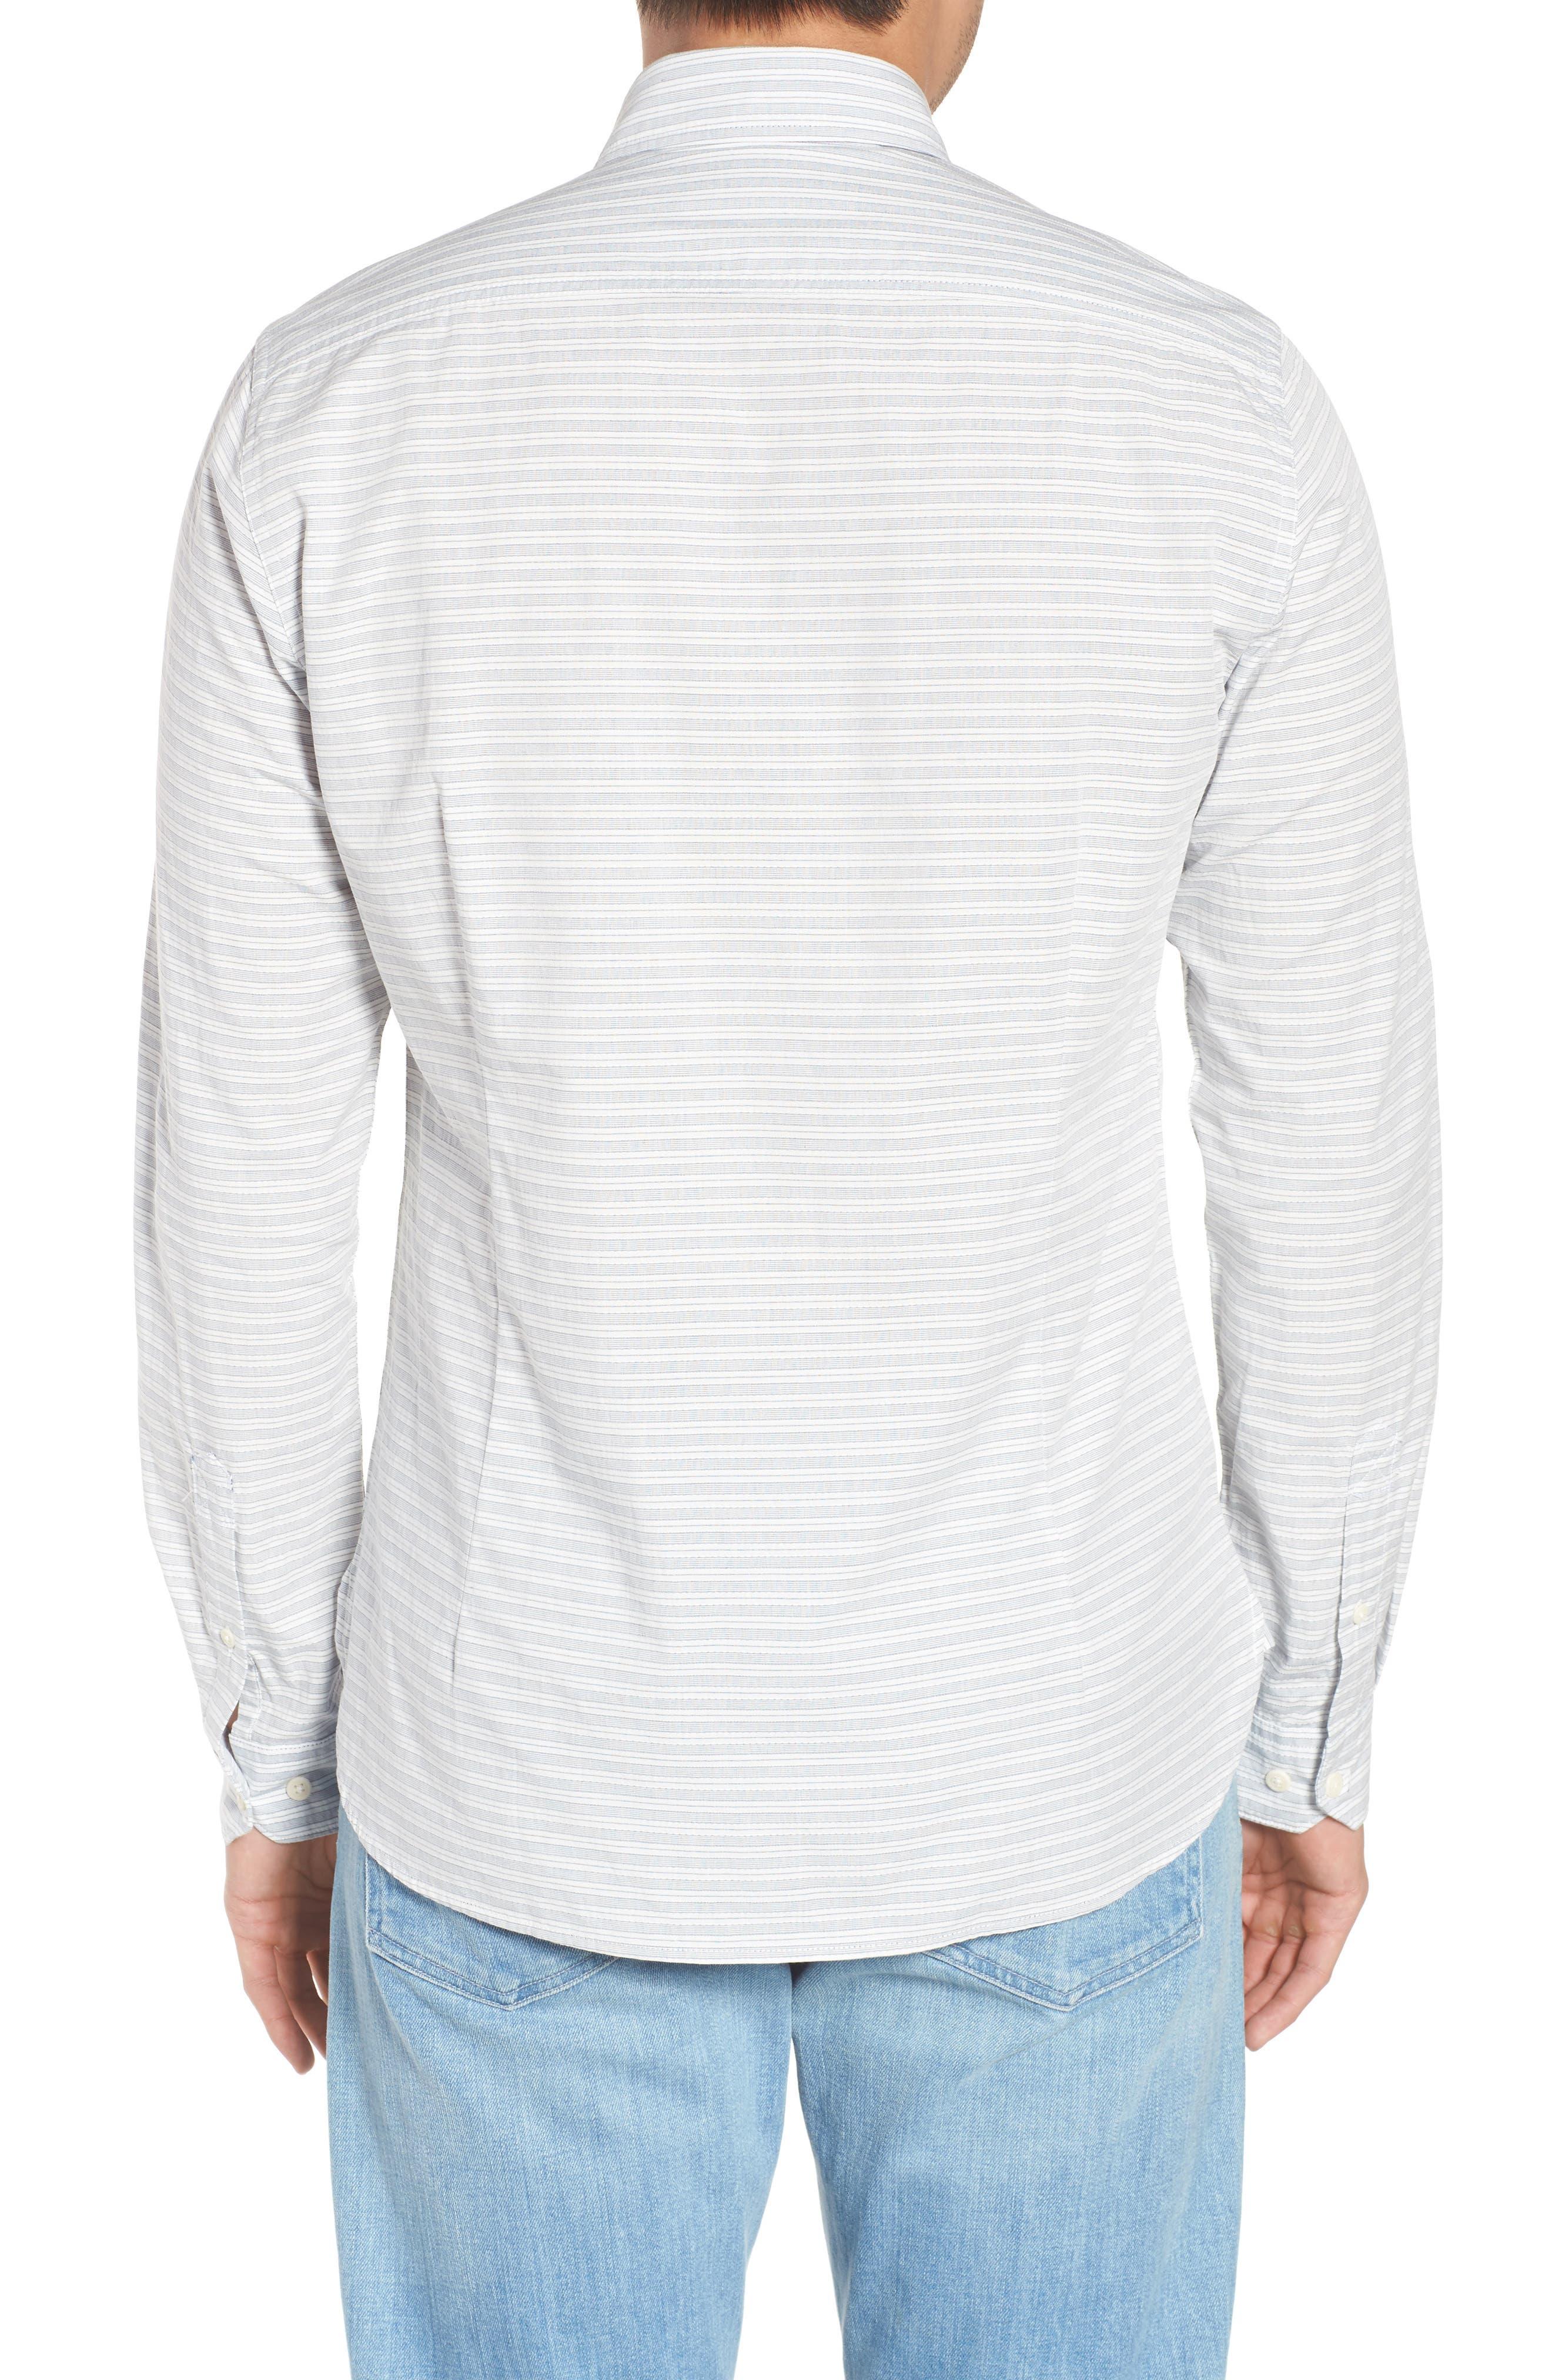 Huchen Regular Fit Stripe Sport Shirt,                             Alternate thumbnail 2, color,                             100